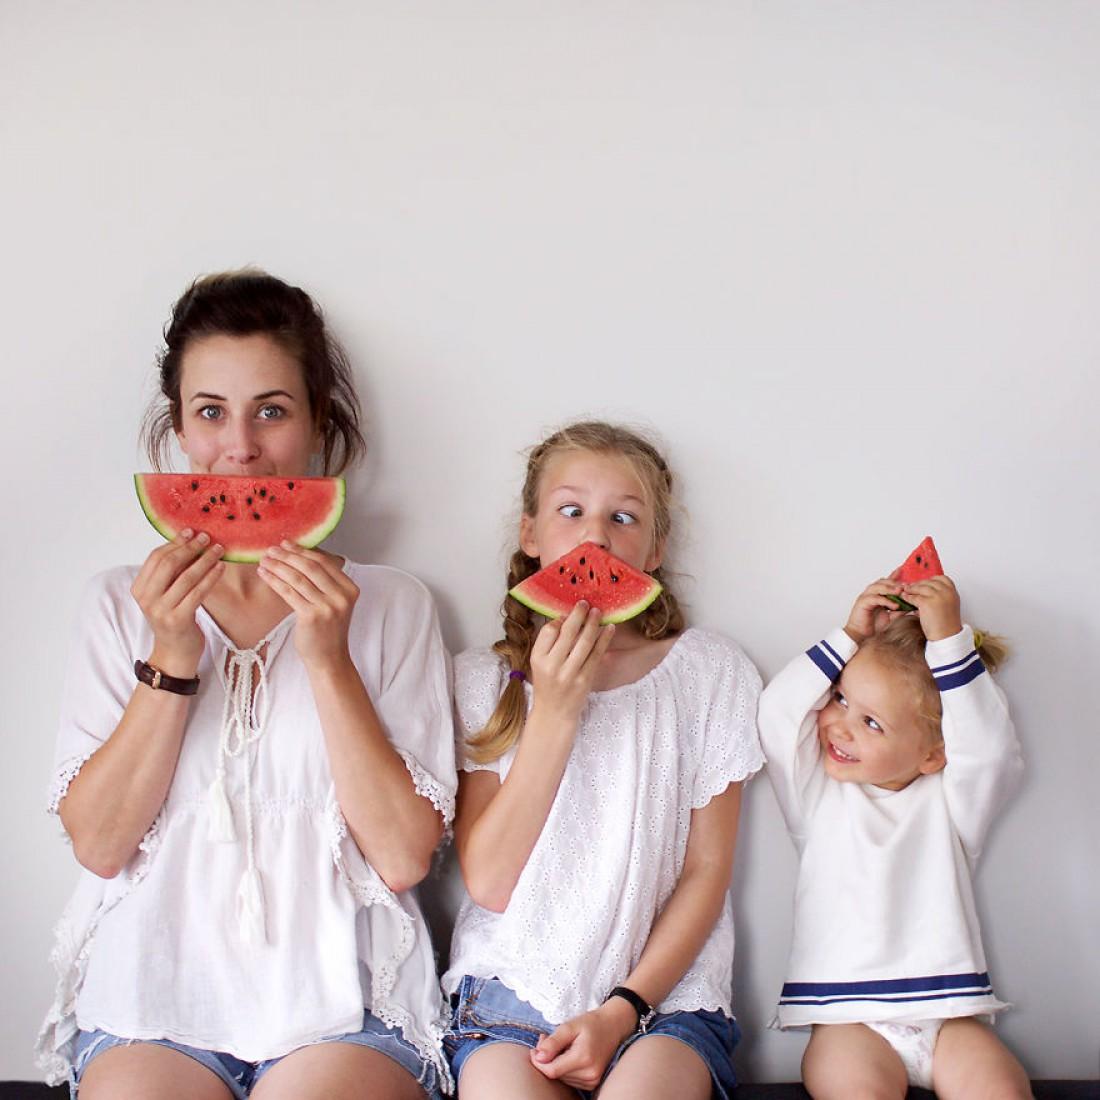 Доминик со своими дочками Амелии и Пенни